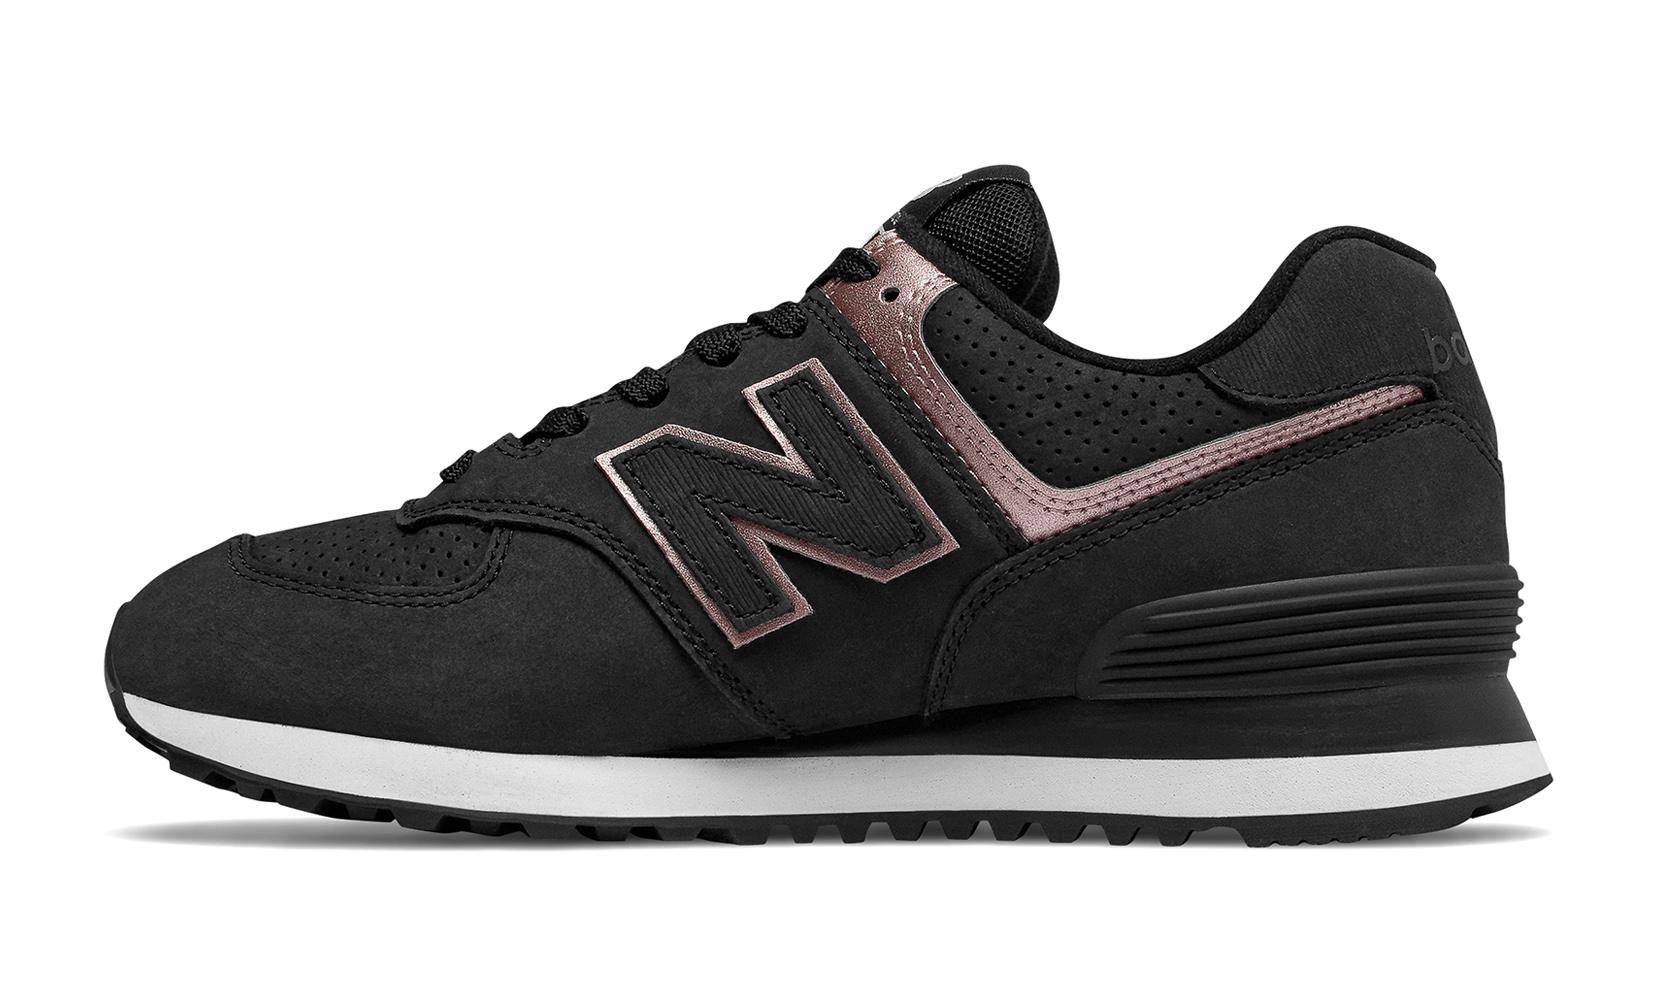 Жіноче взуття повсякденне New Balance 574 Nubuck WL574NBK | New Balance